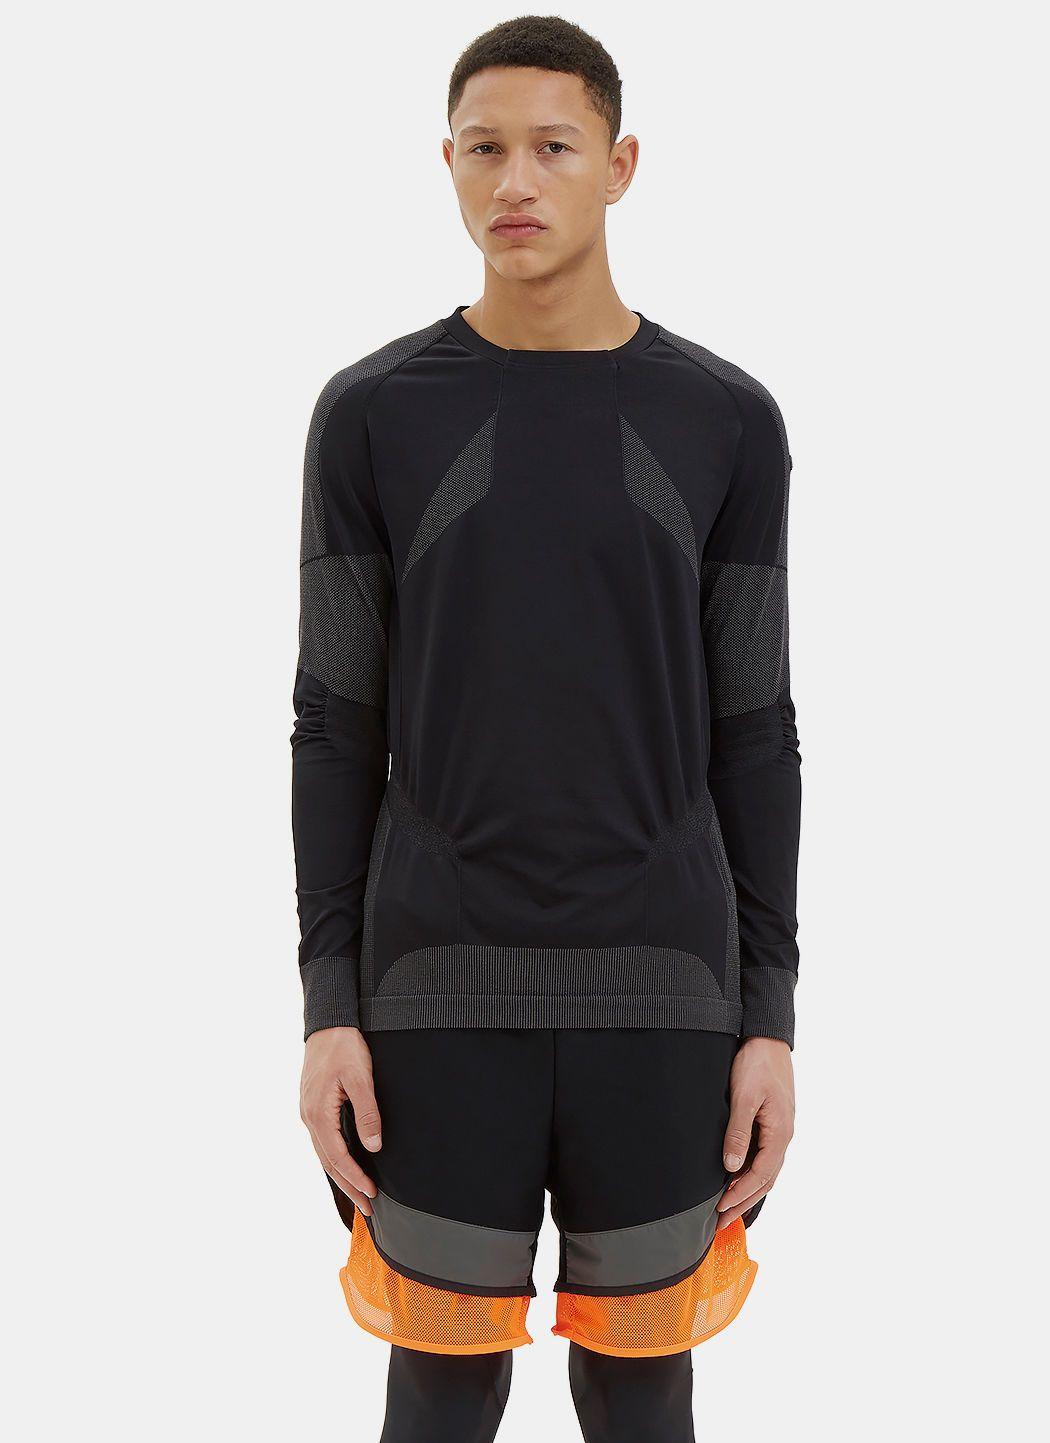 Men'S Warp Knit Top In Black